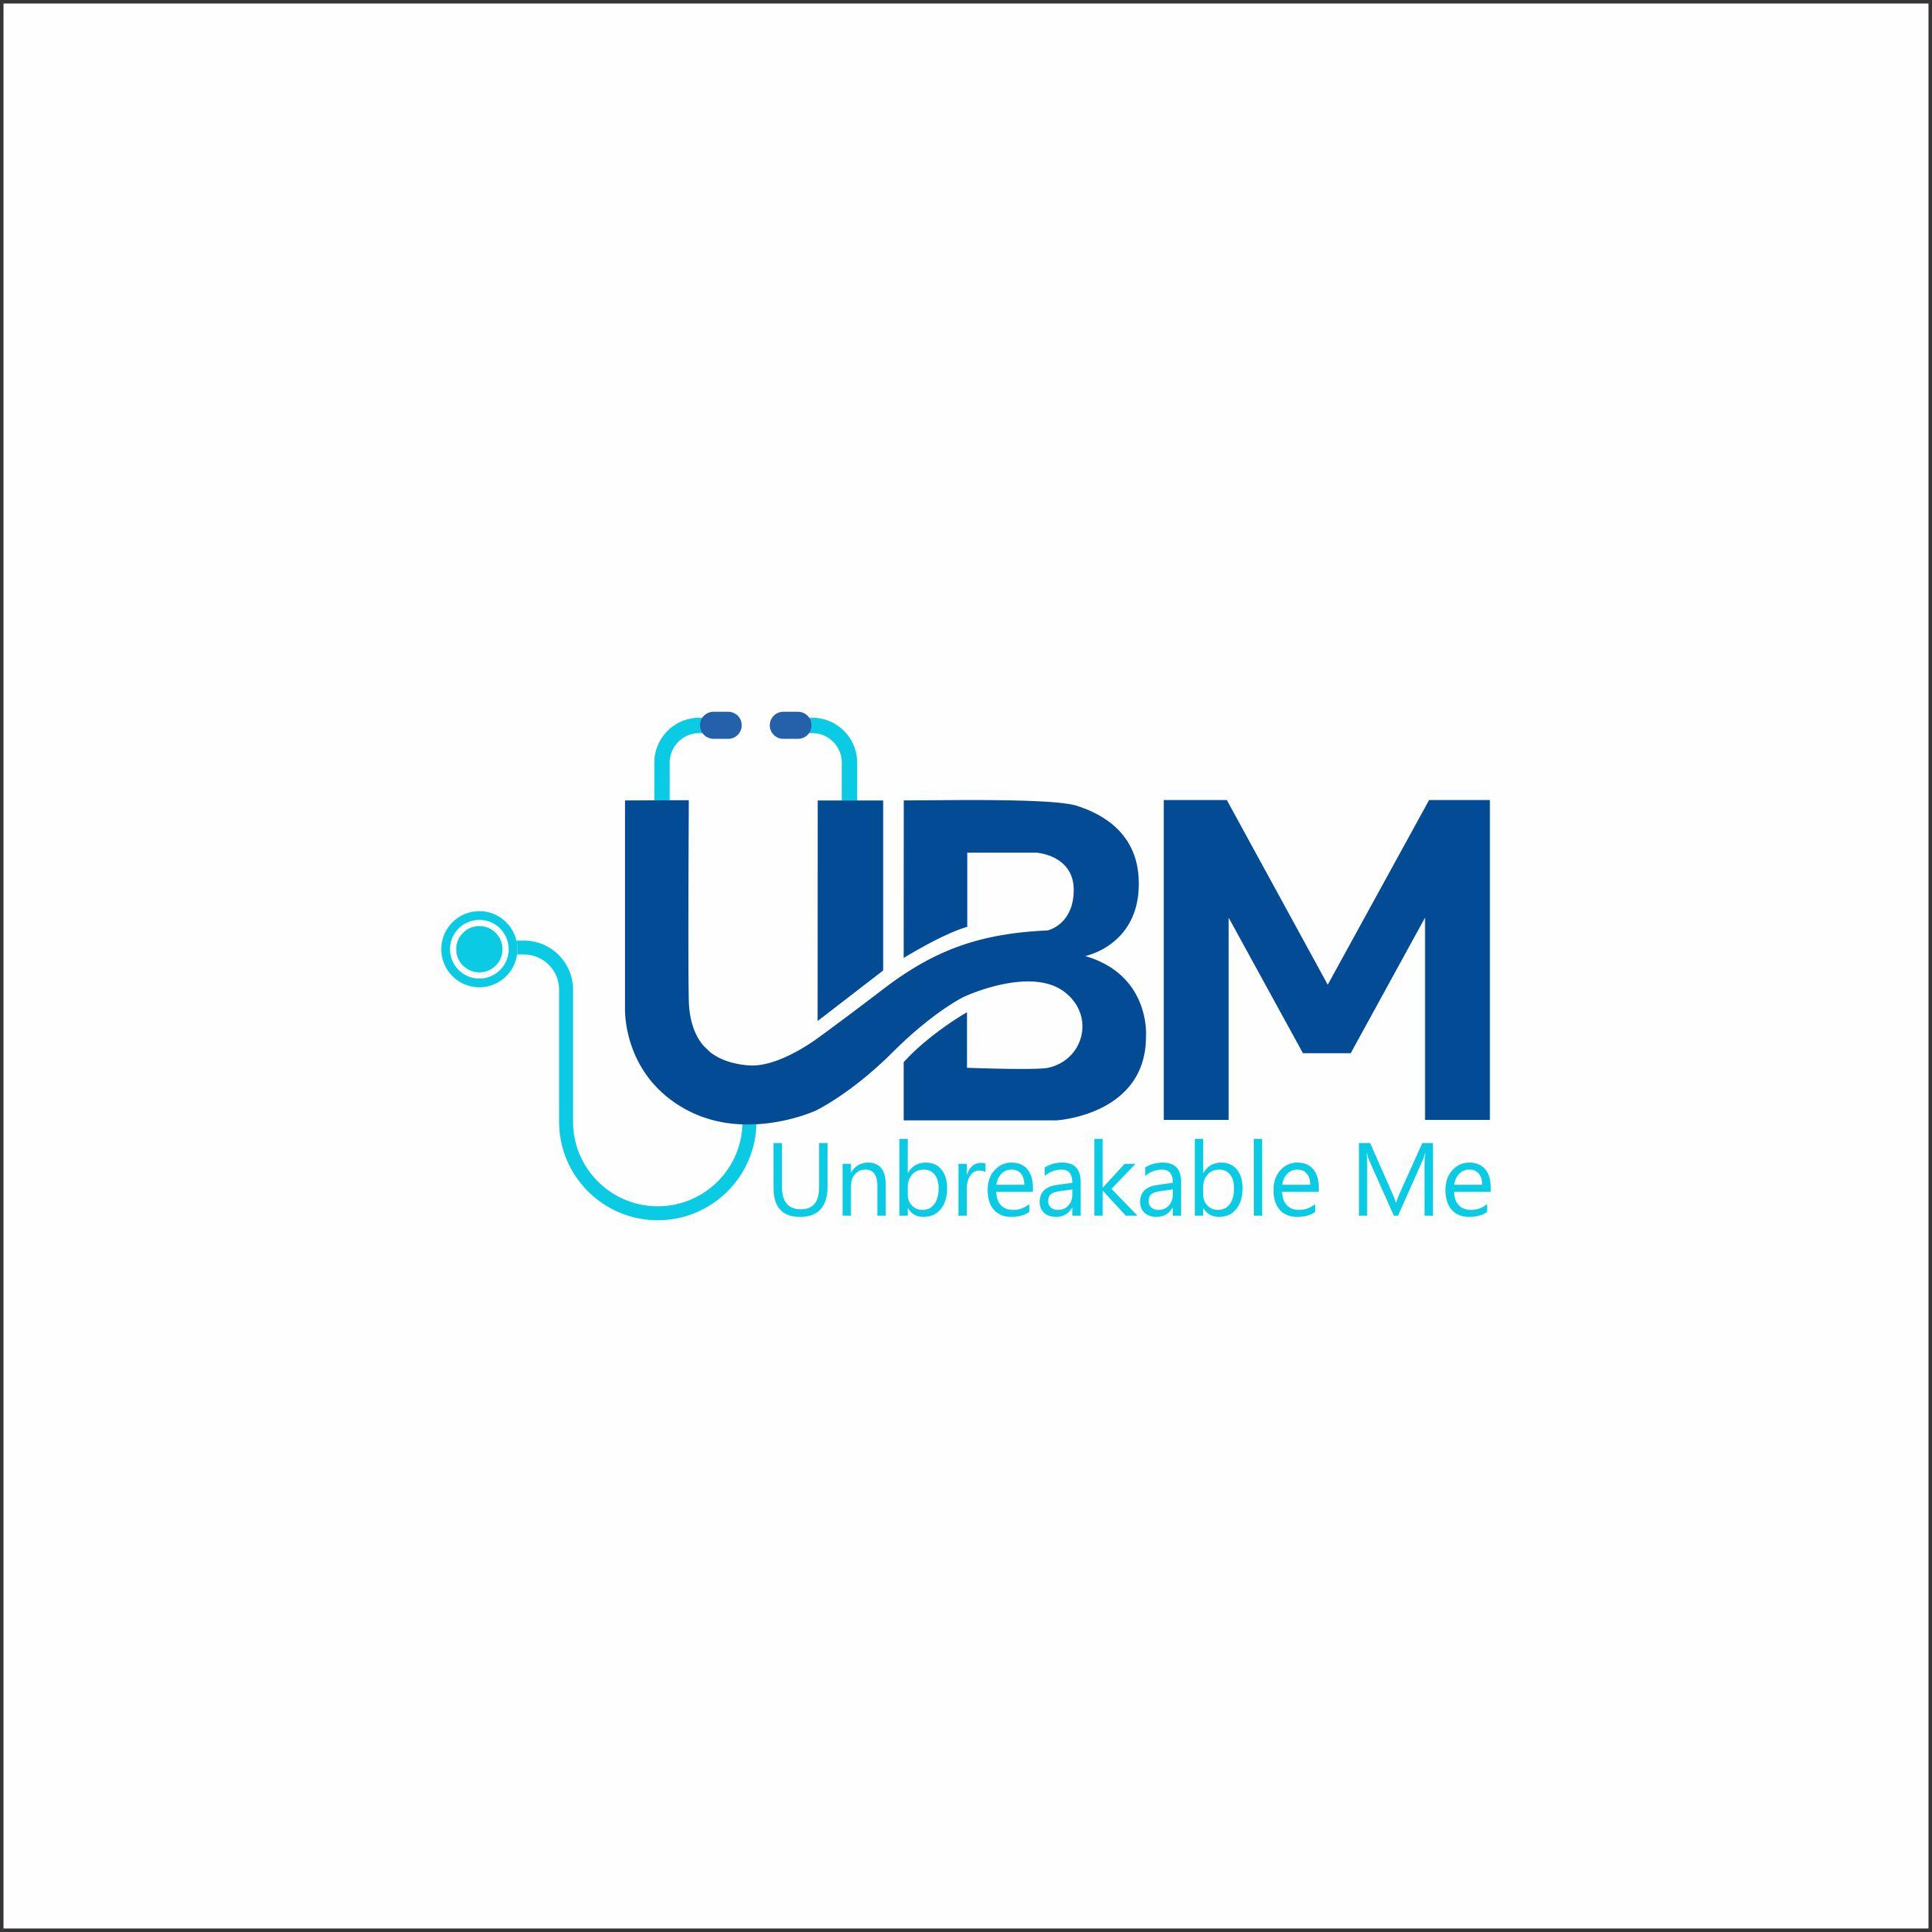 Unbreakable Me LLC